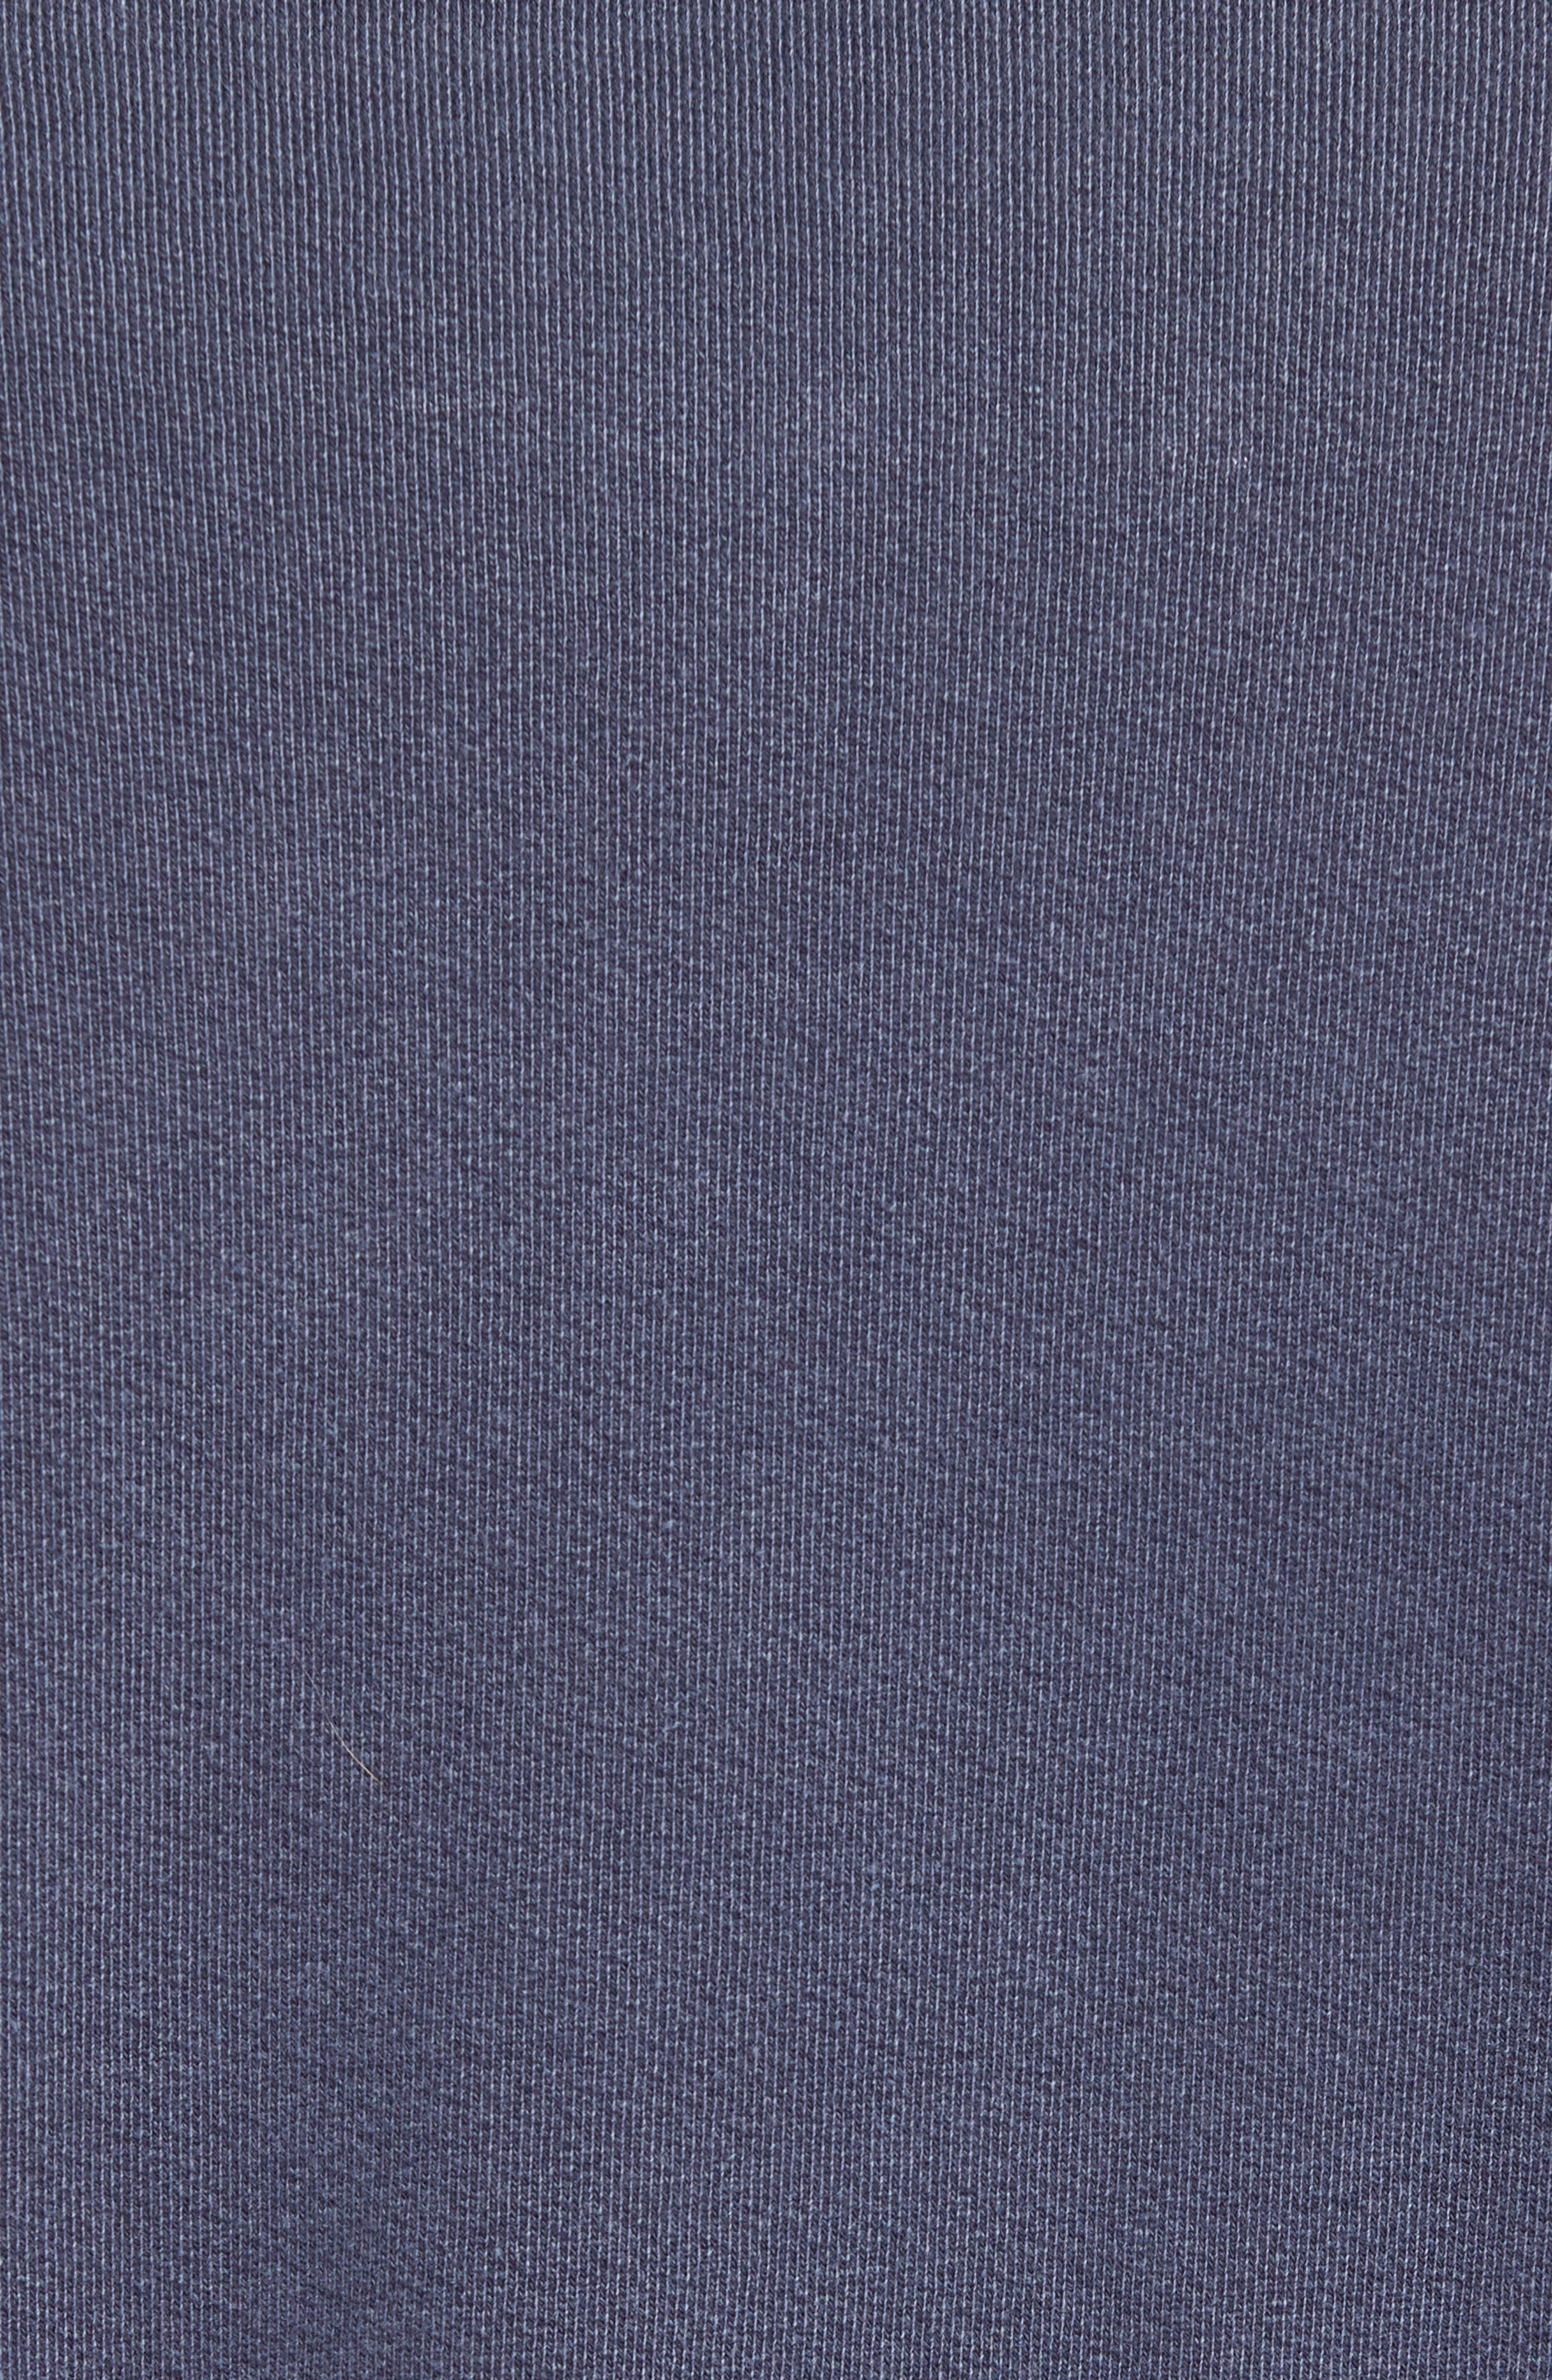 Vintage Crewneck Sweatshirt,                             Alternate thumbnail 14, color,